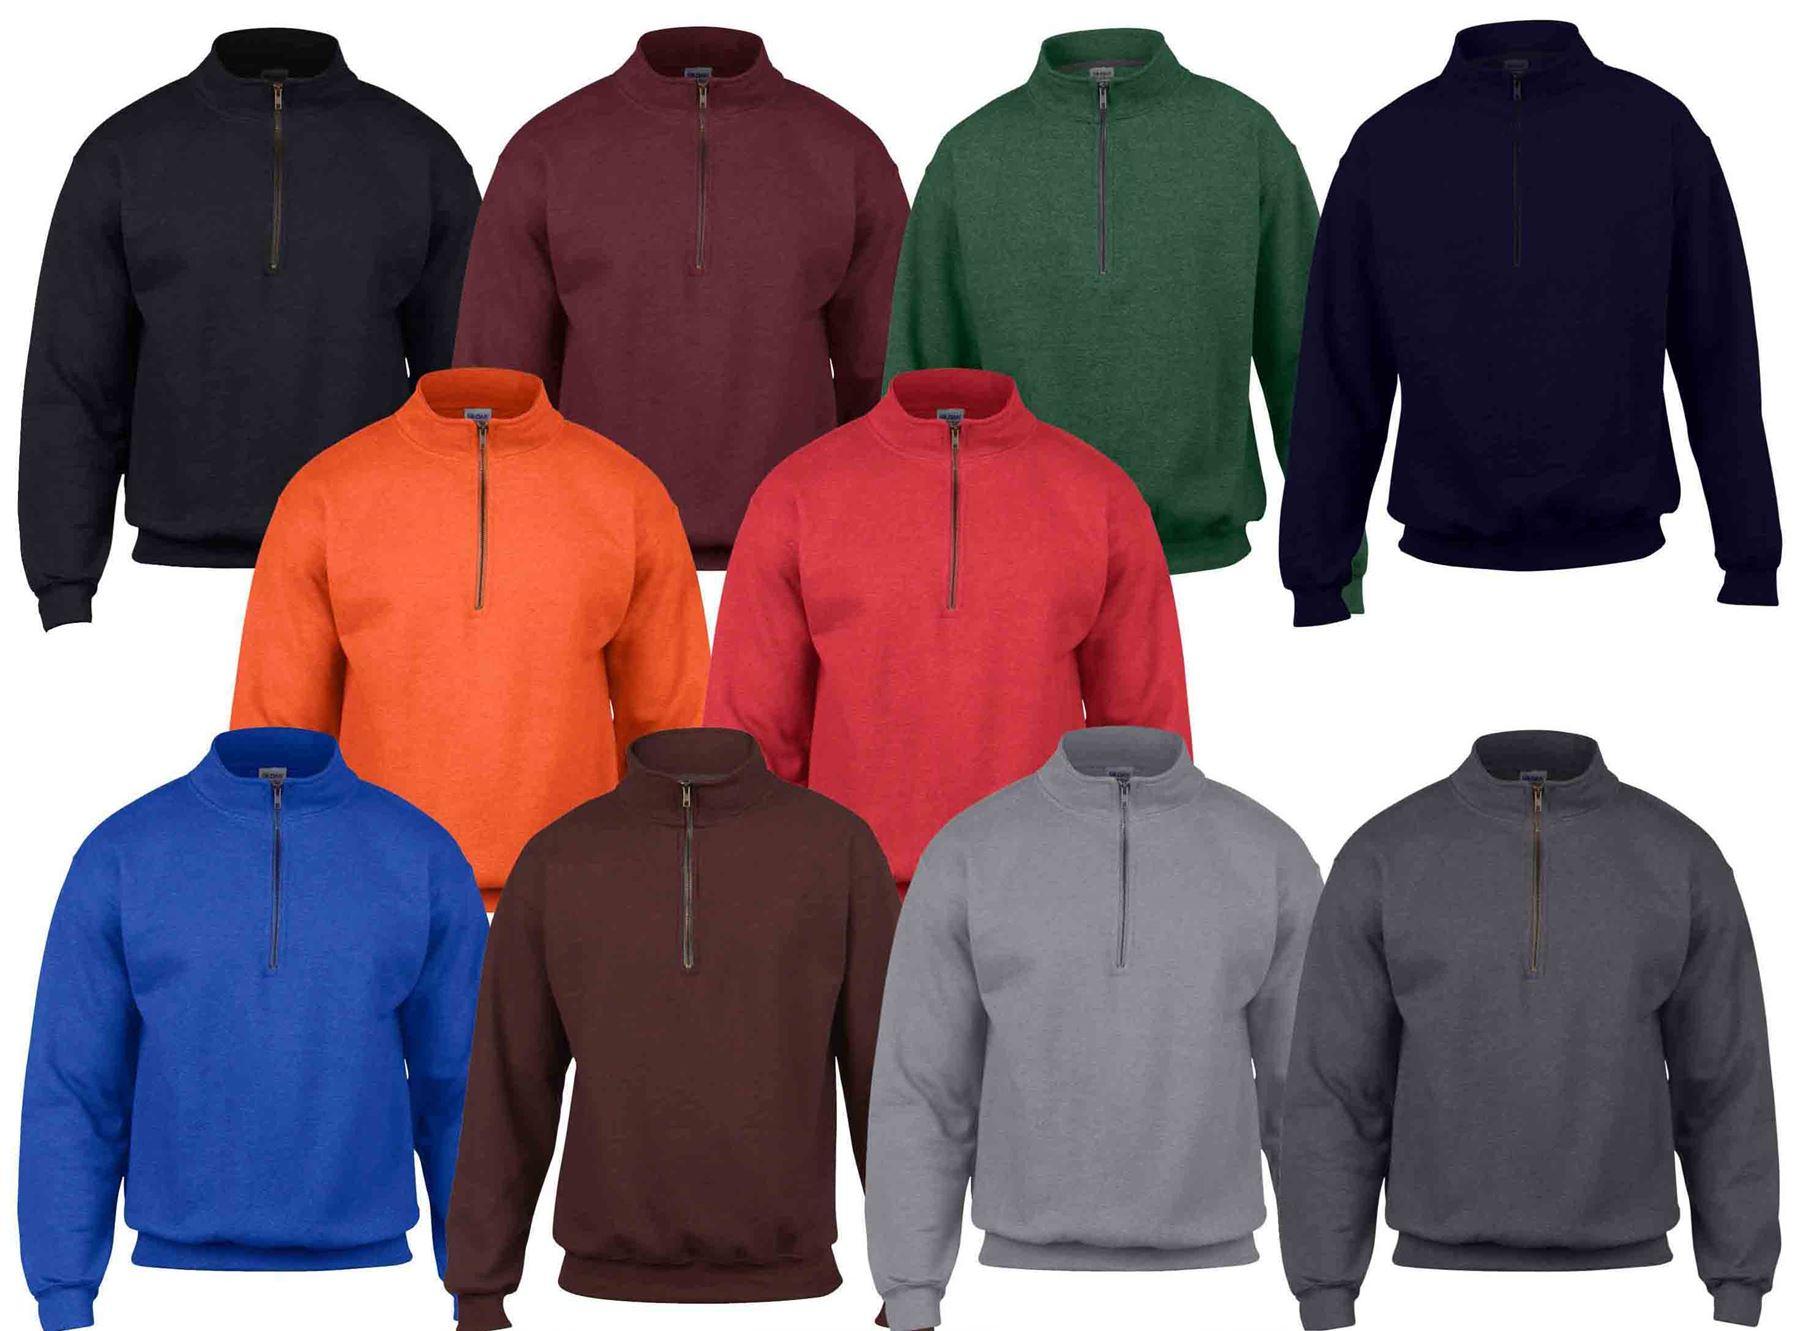 Gildan HeavyBlend Men/'s Vintage 1//4 Zip Pullover Soft Feel Sweatshirt Jumper New